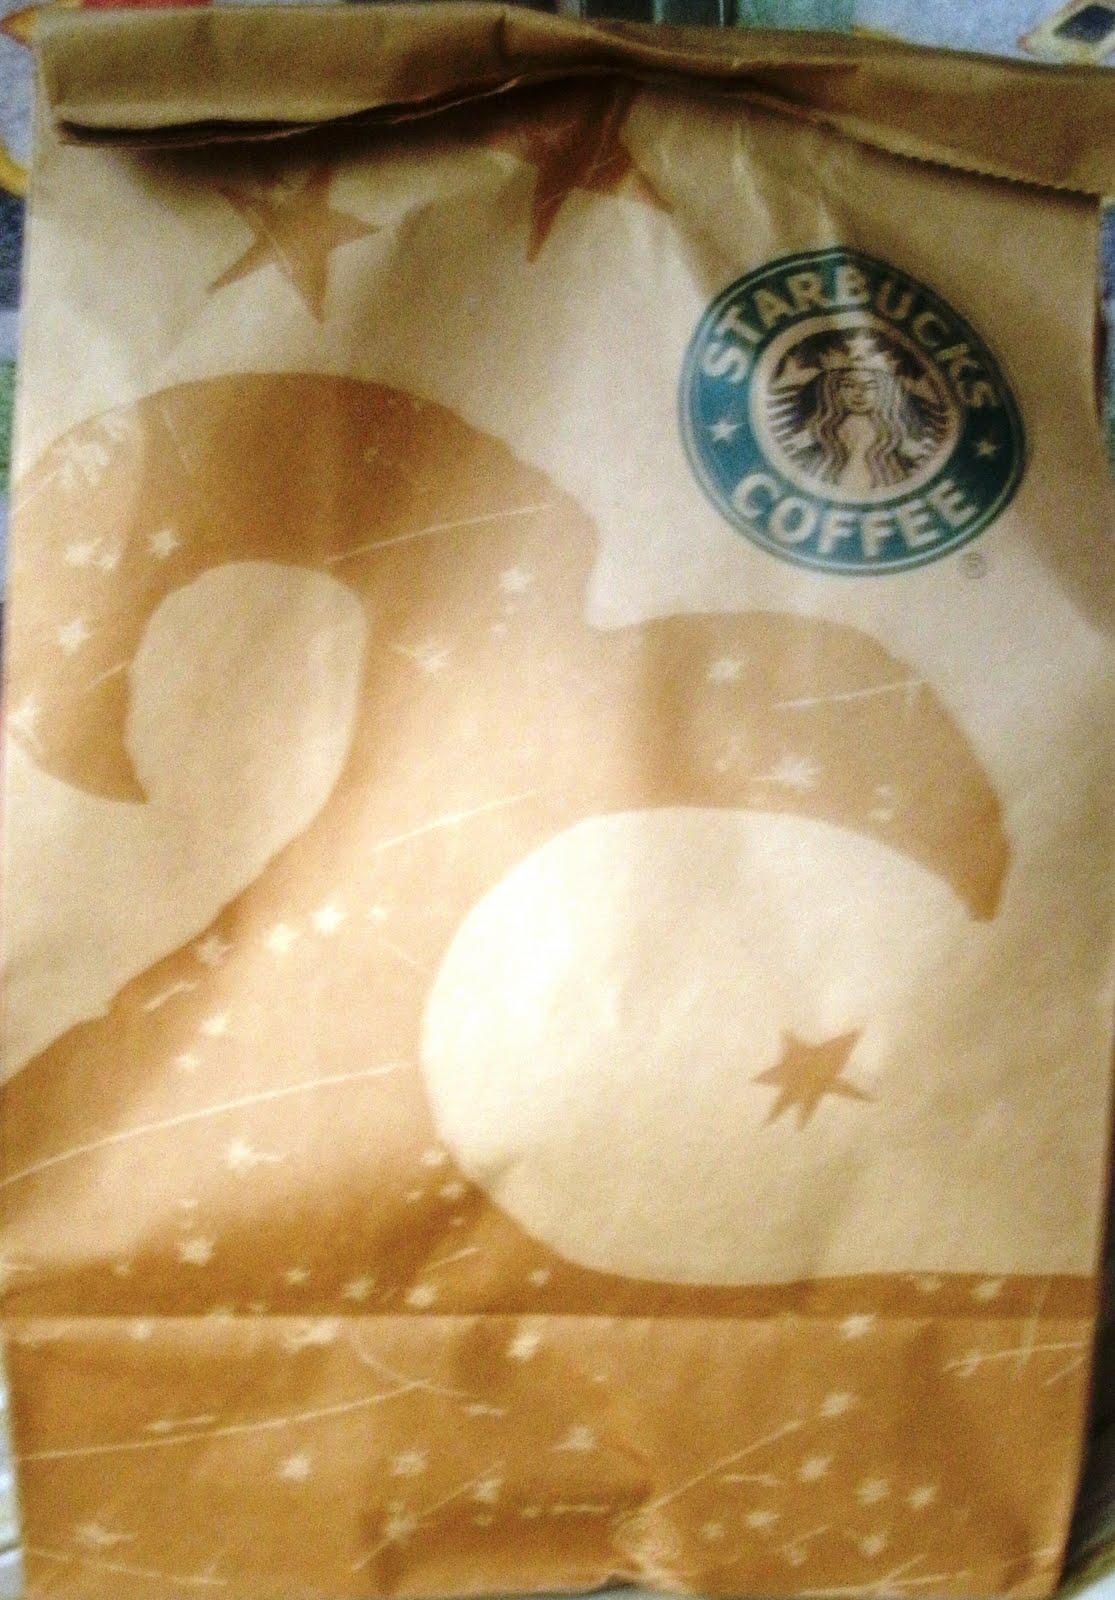 Miss Table Napkin Starbucks Apple Fritter Espresso Java